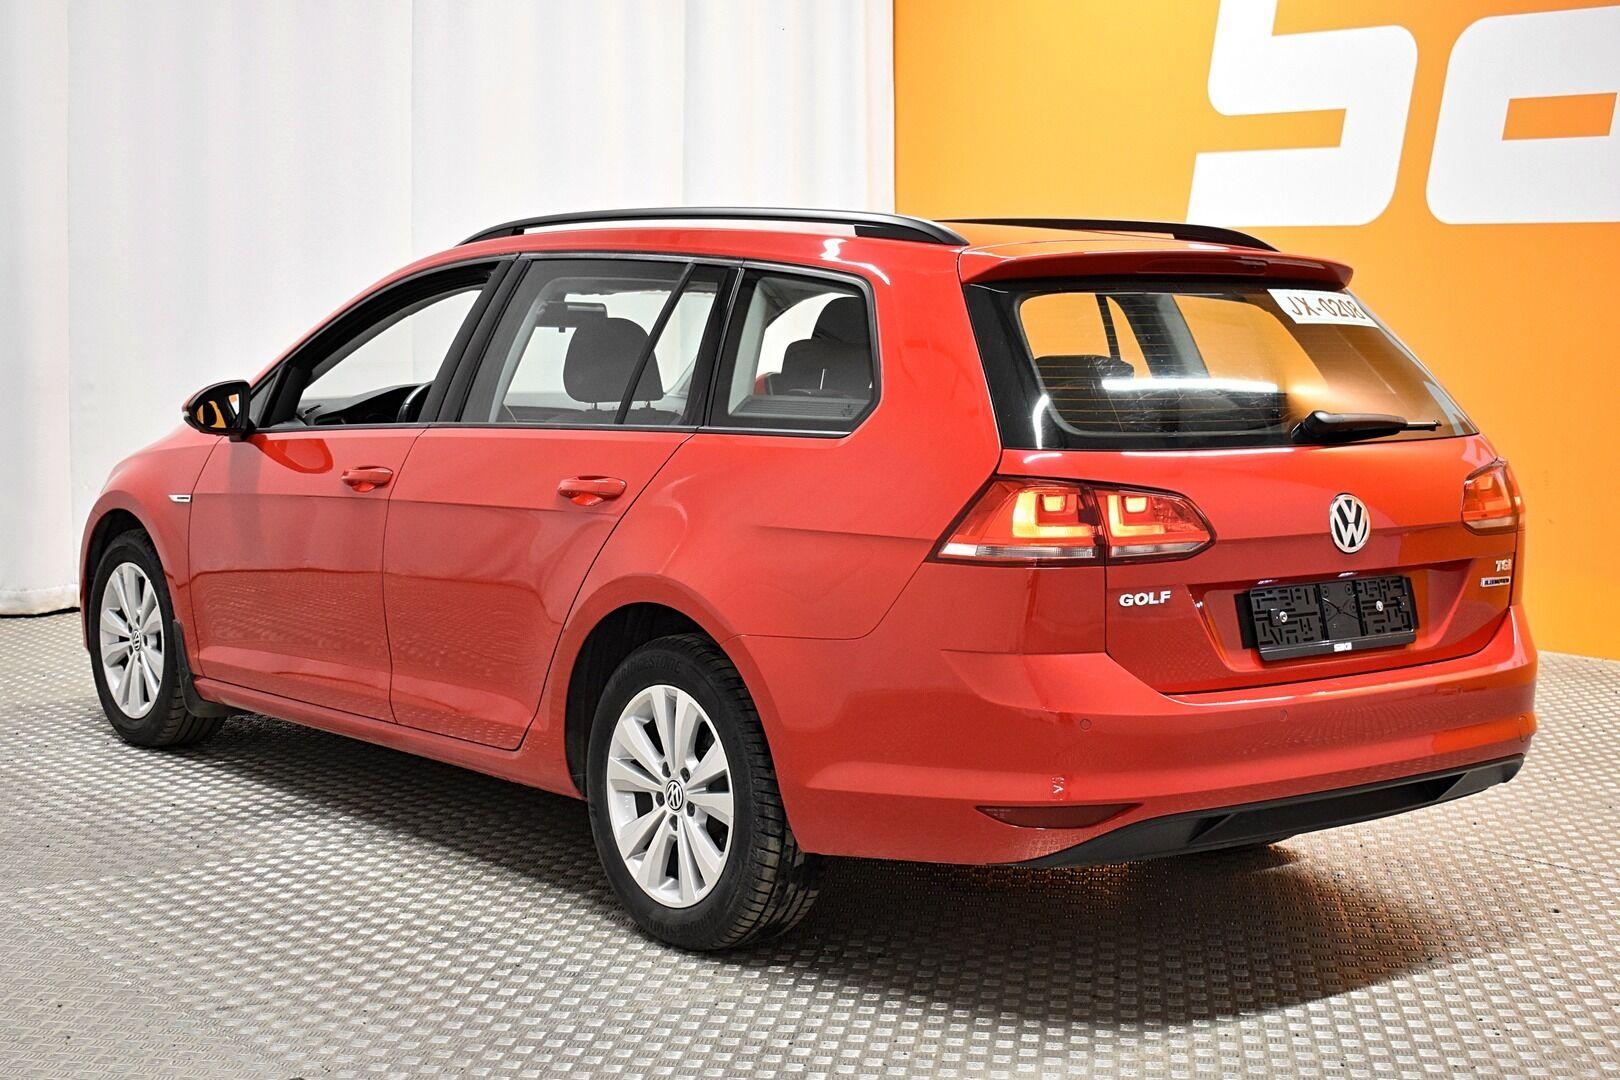 Punainen Farmari, Volkswagen Golf – LEM-79340, kuva 5